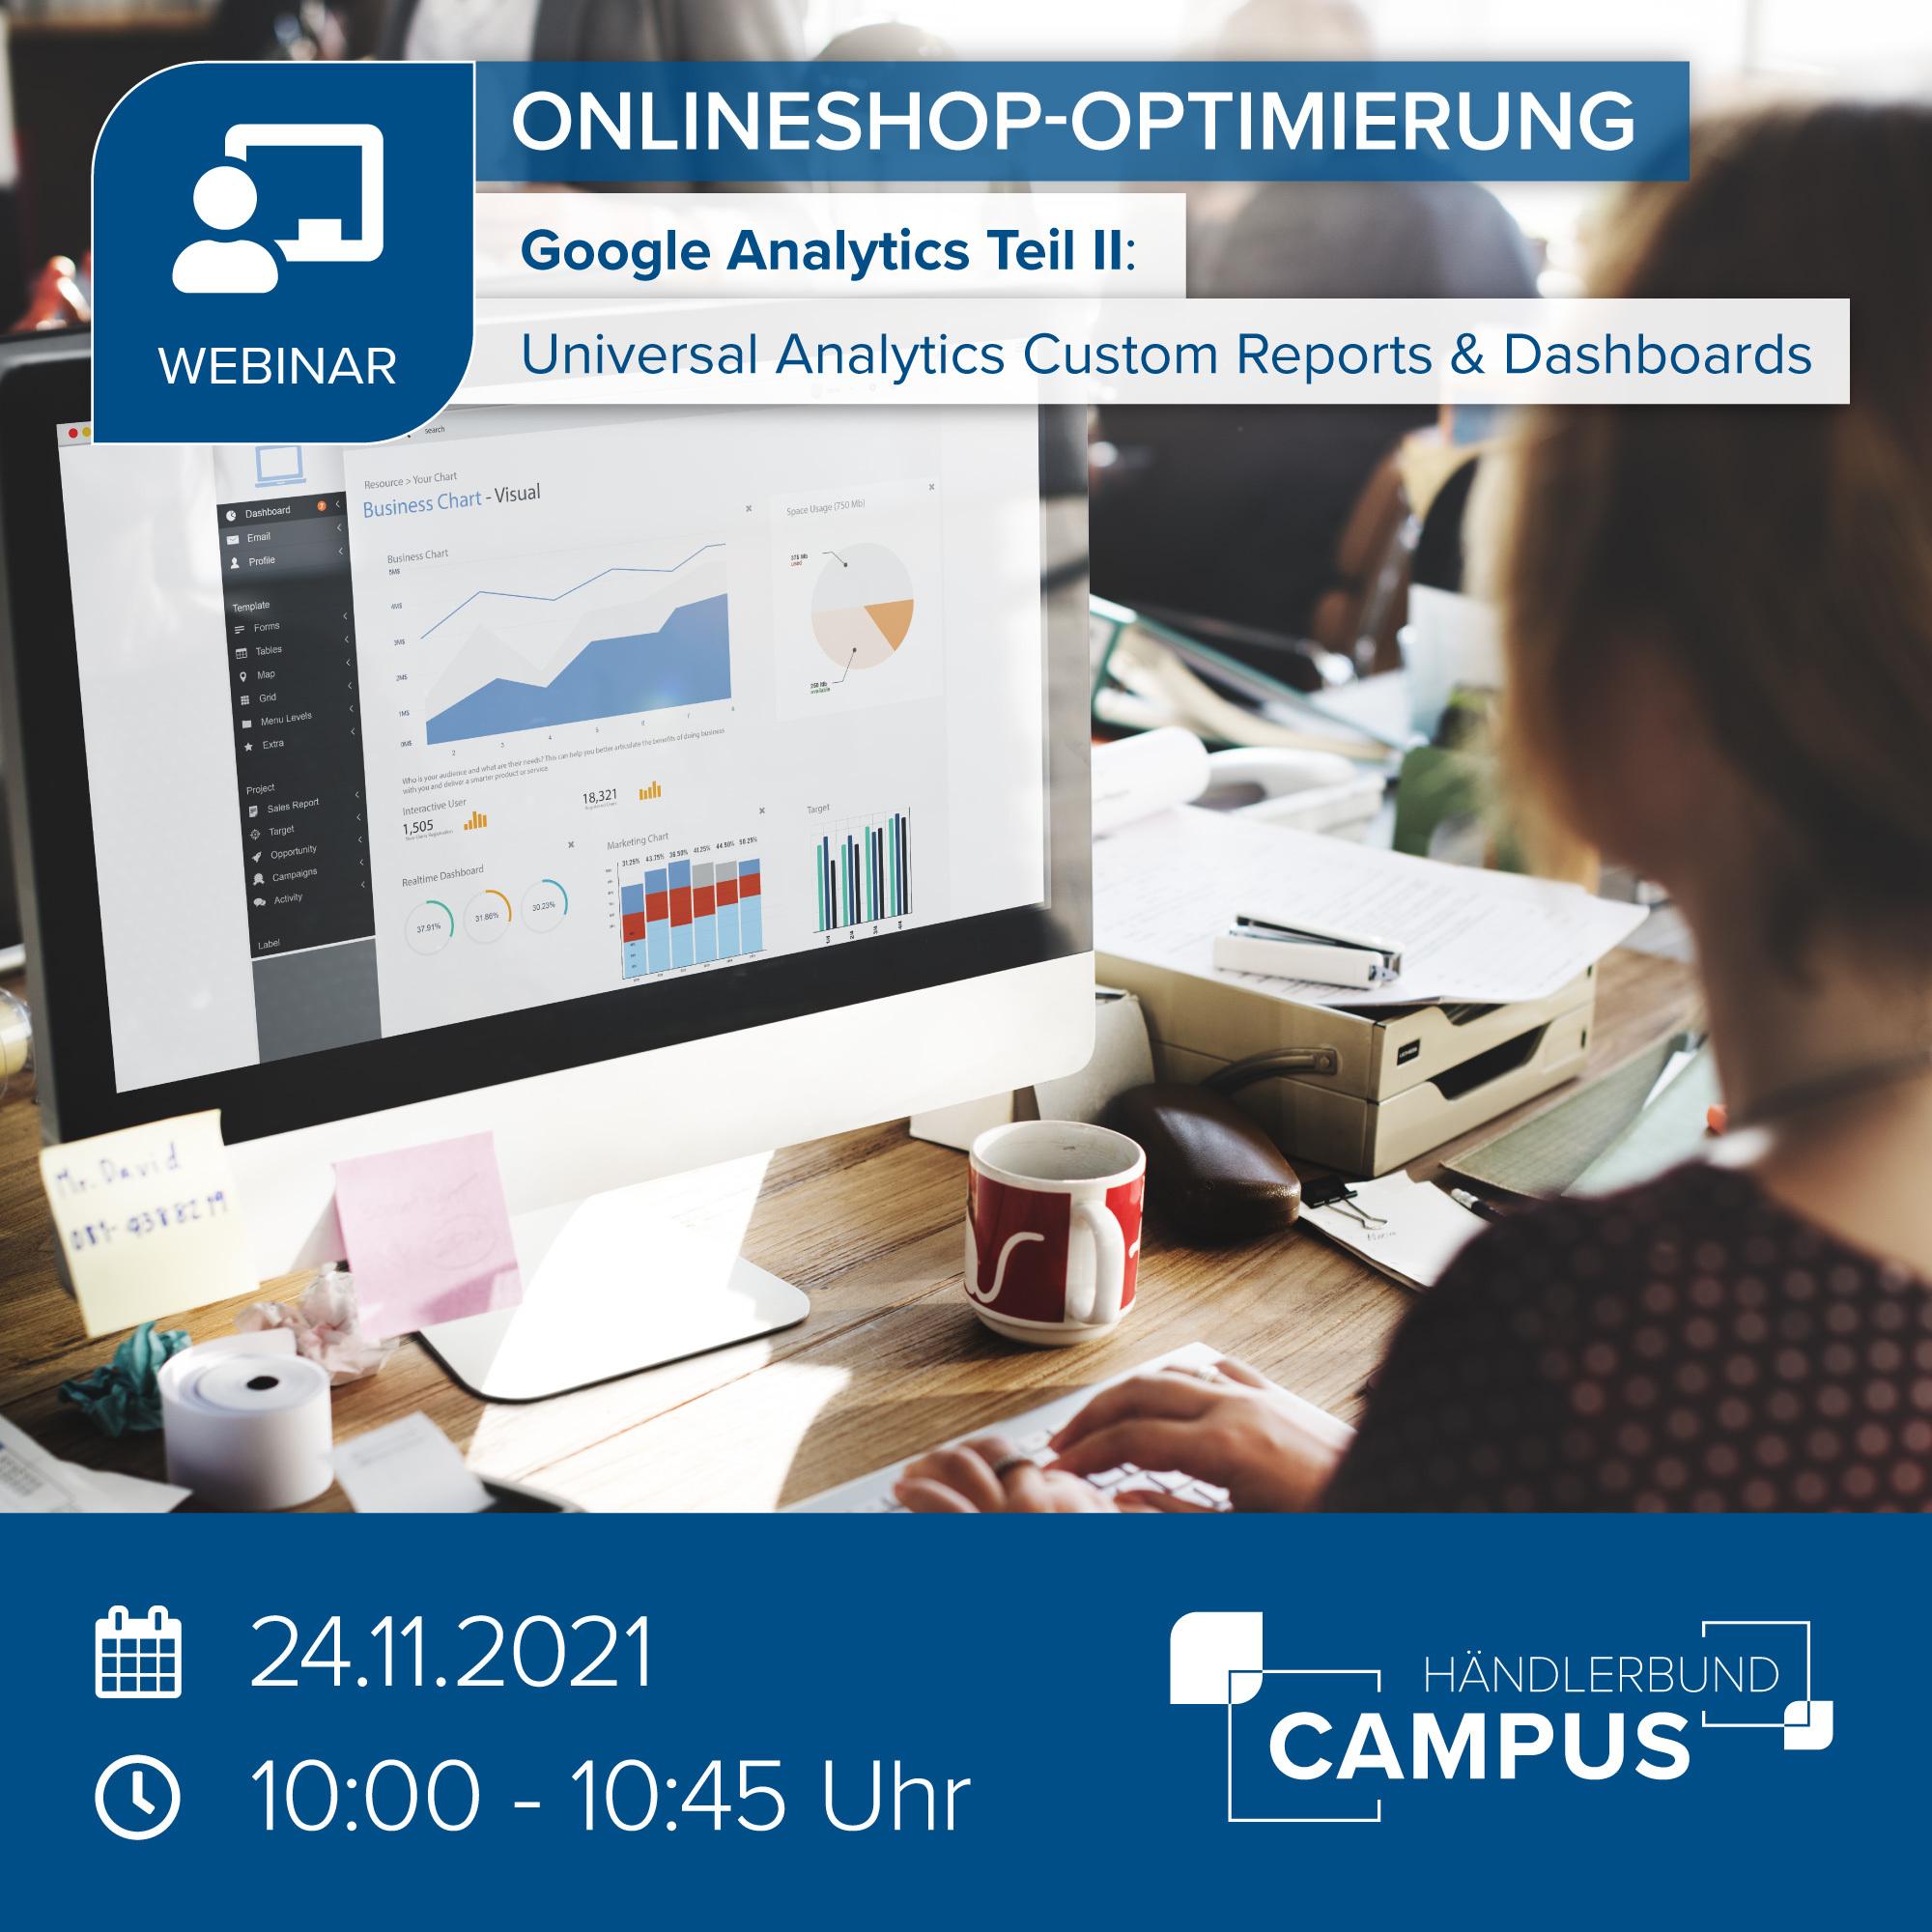 SHOP-OPTIMIERUNG-Google Analytics-II_2000x2000-1